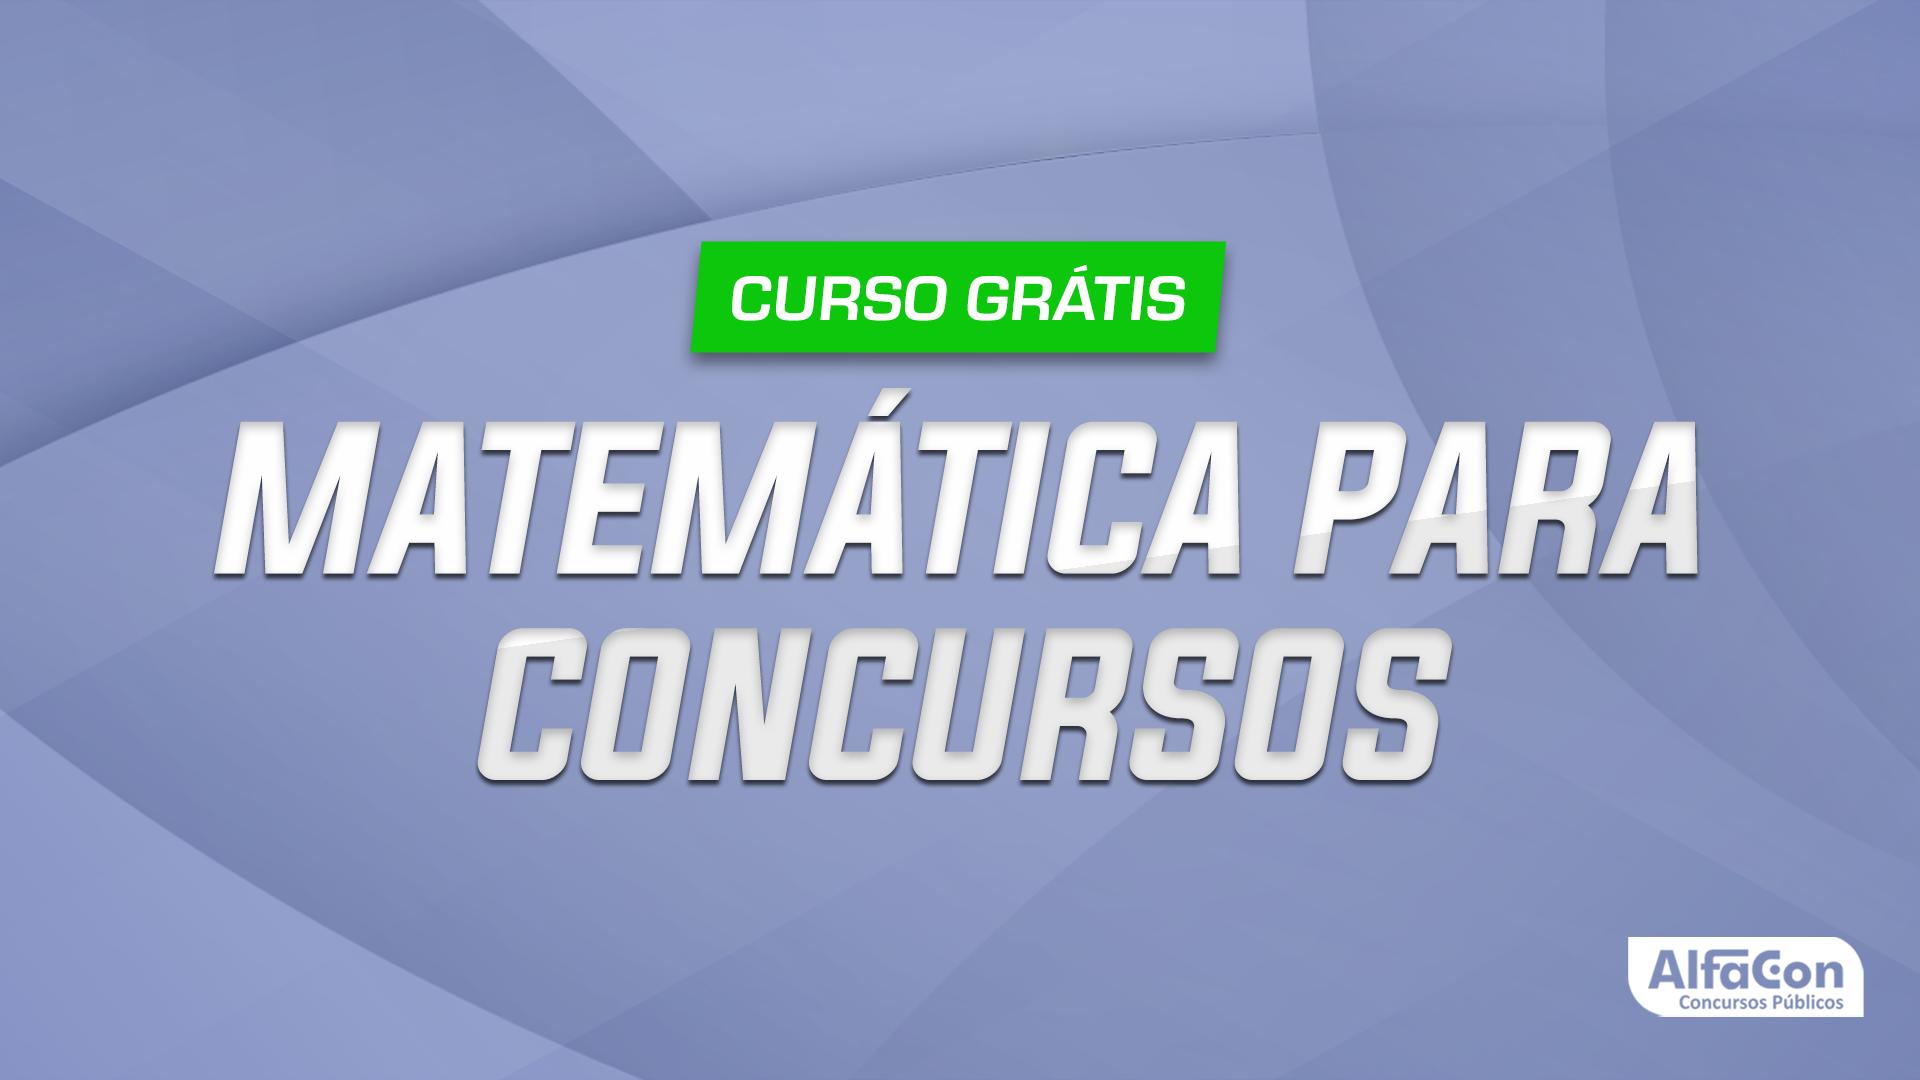 Curso de Matemática Para Concursos - Gratuito